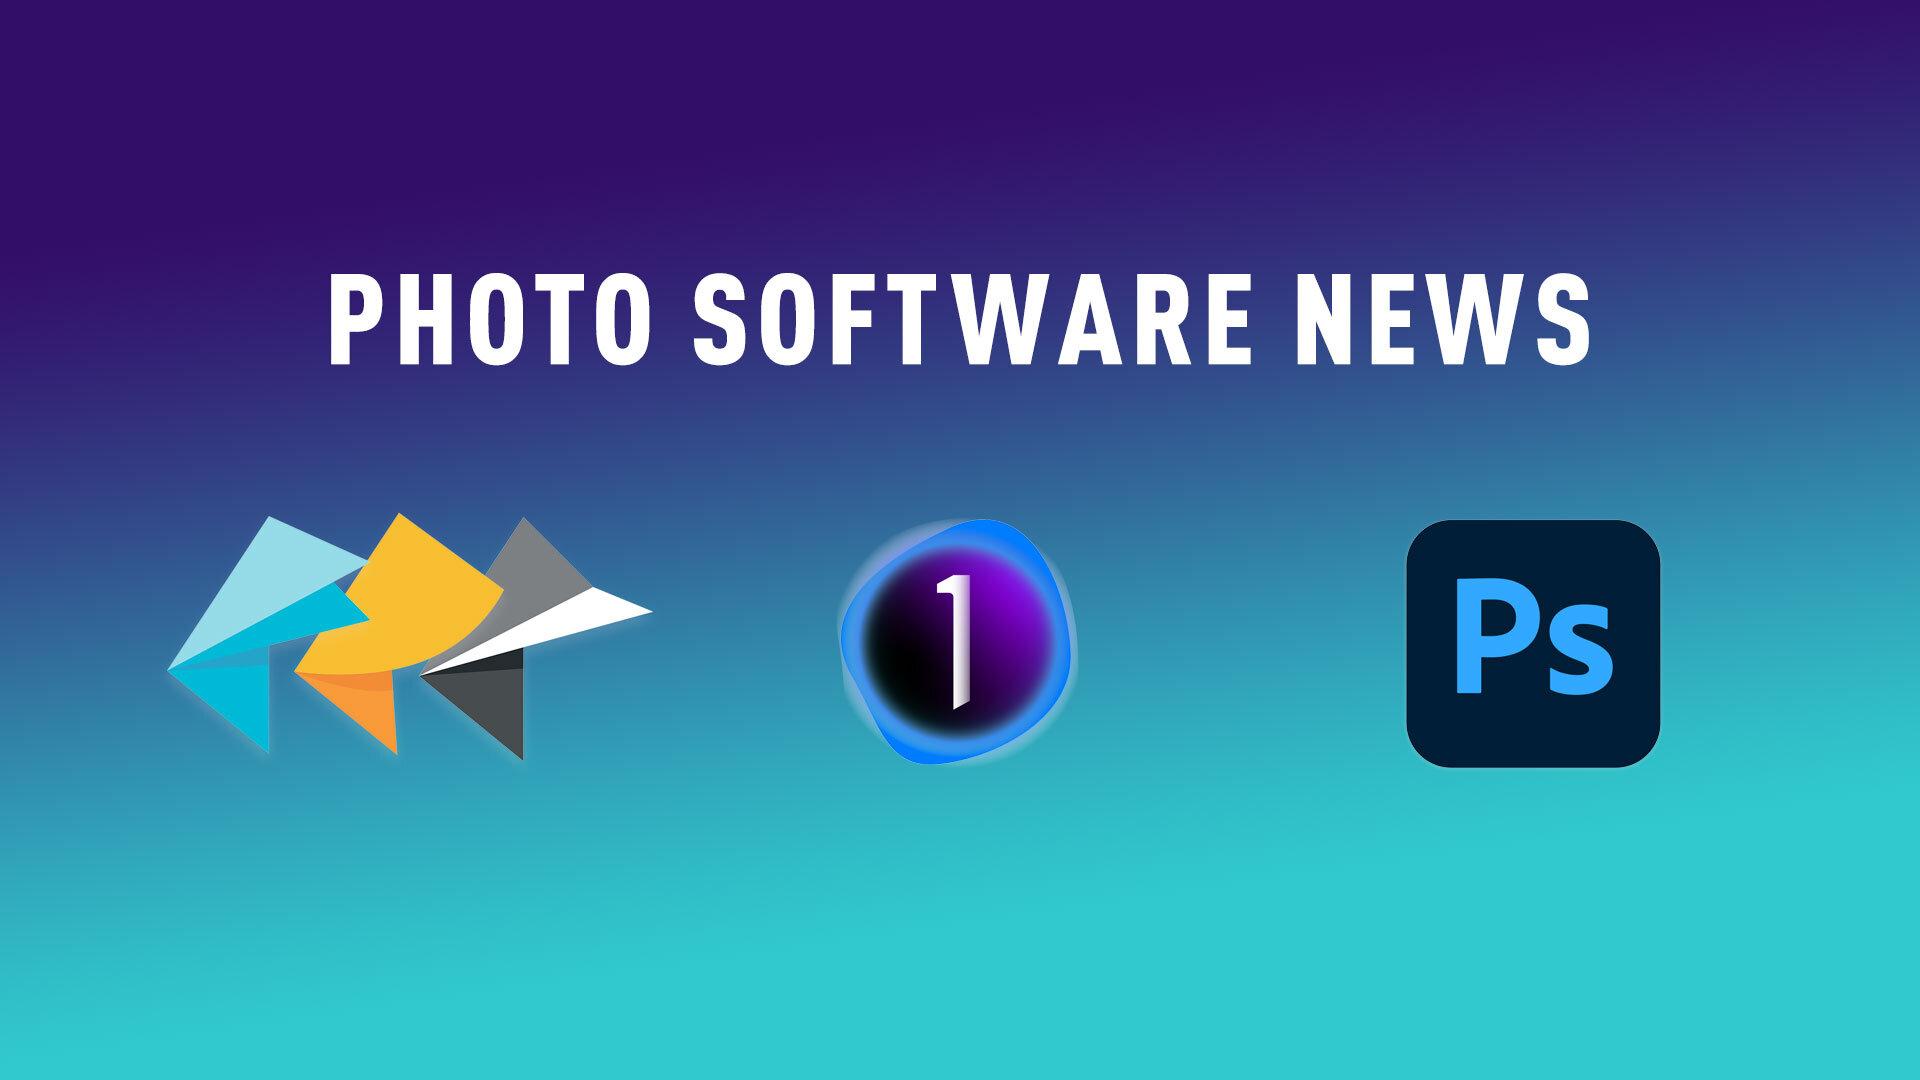 escocés Tomar represalias matiz  Photo software News: Nik Software Anniversary, Capture One News and  Photoshop M1 Beta — Thomas Fitzgerald Photography